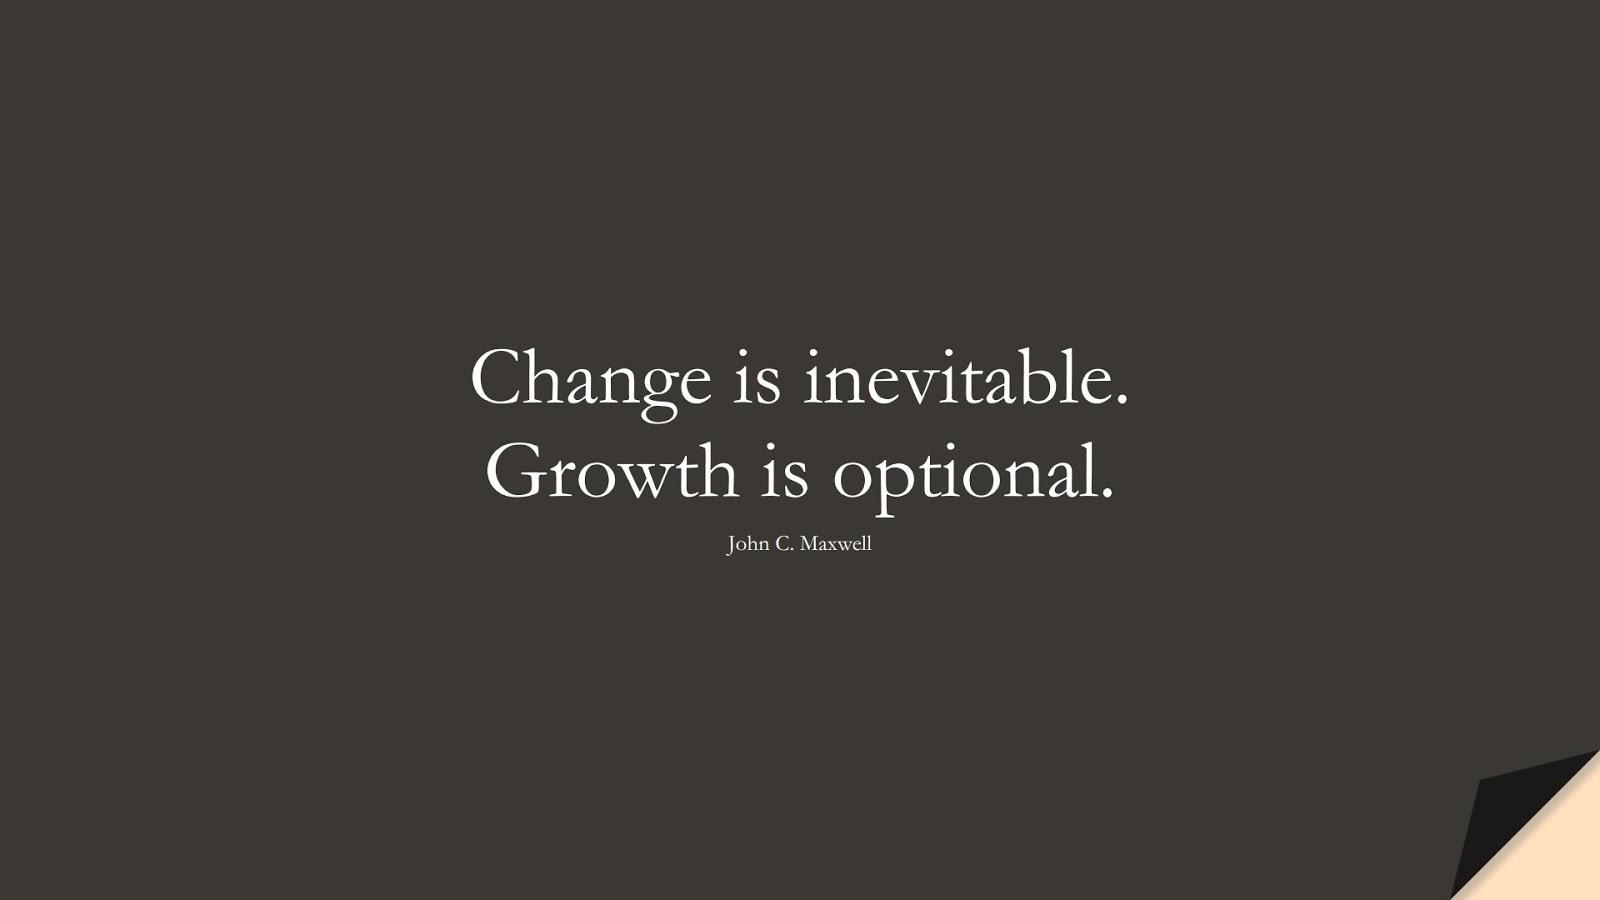 Change is inevitable. Growth is optional. (John C. Maxwell);  #PositiveQuotes